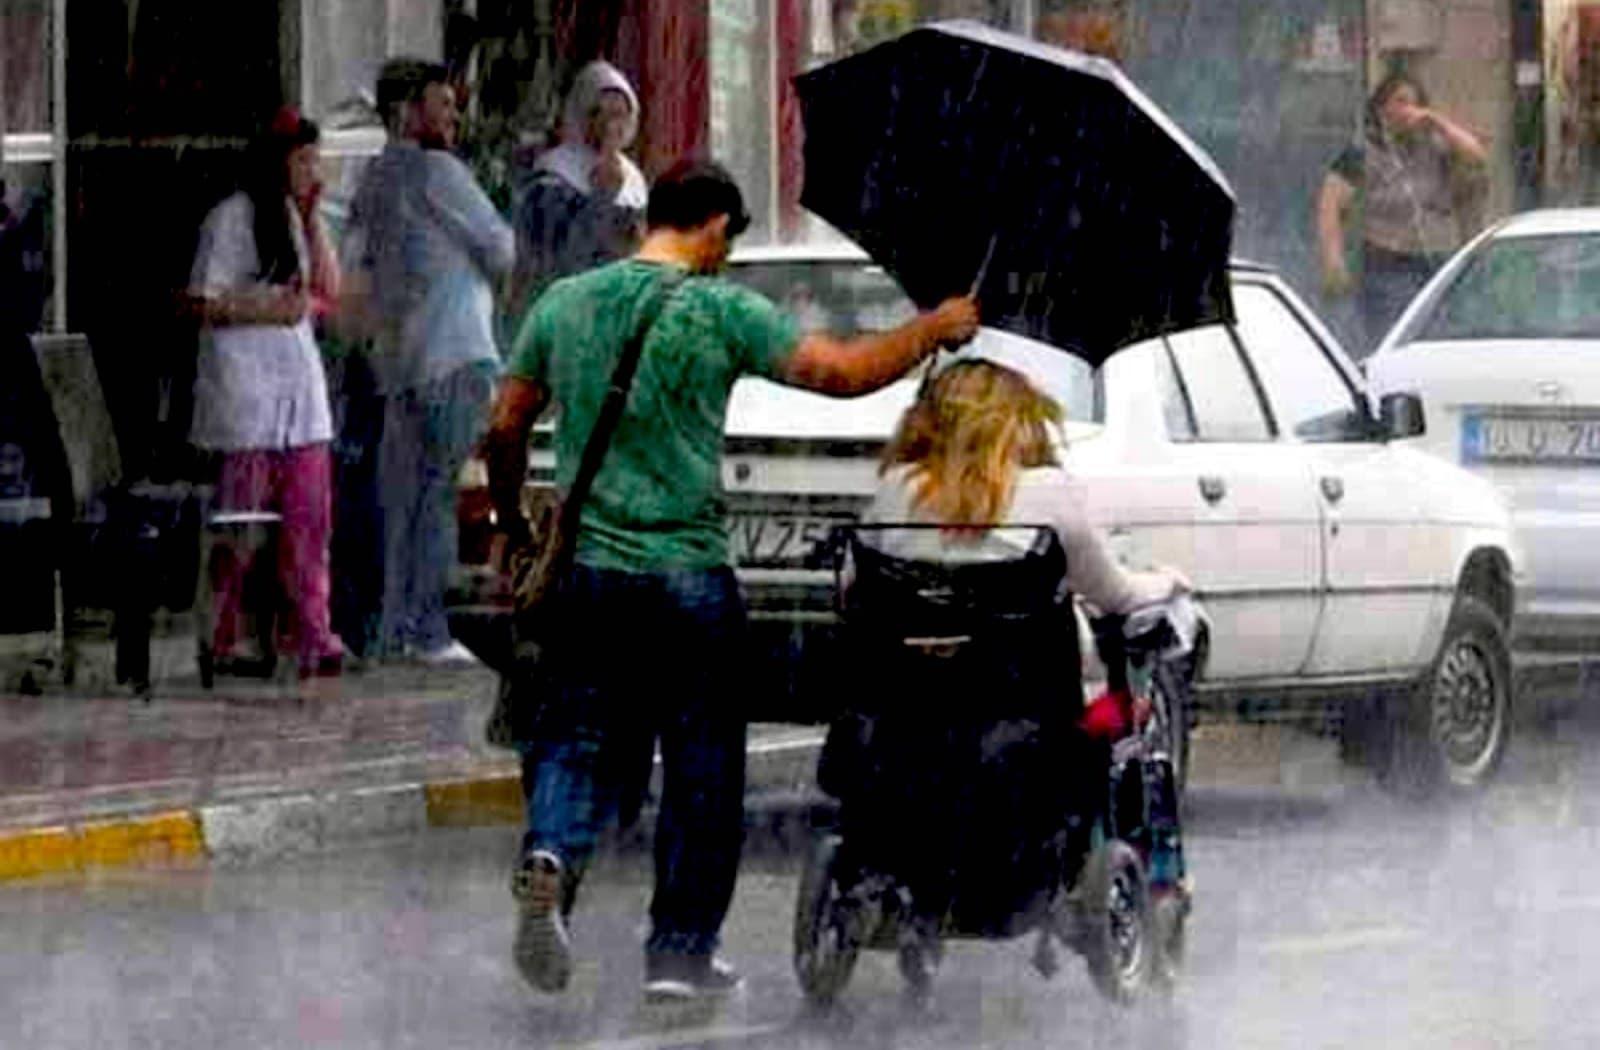 мужчина с зонтом и женщина на коляске